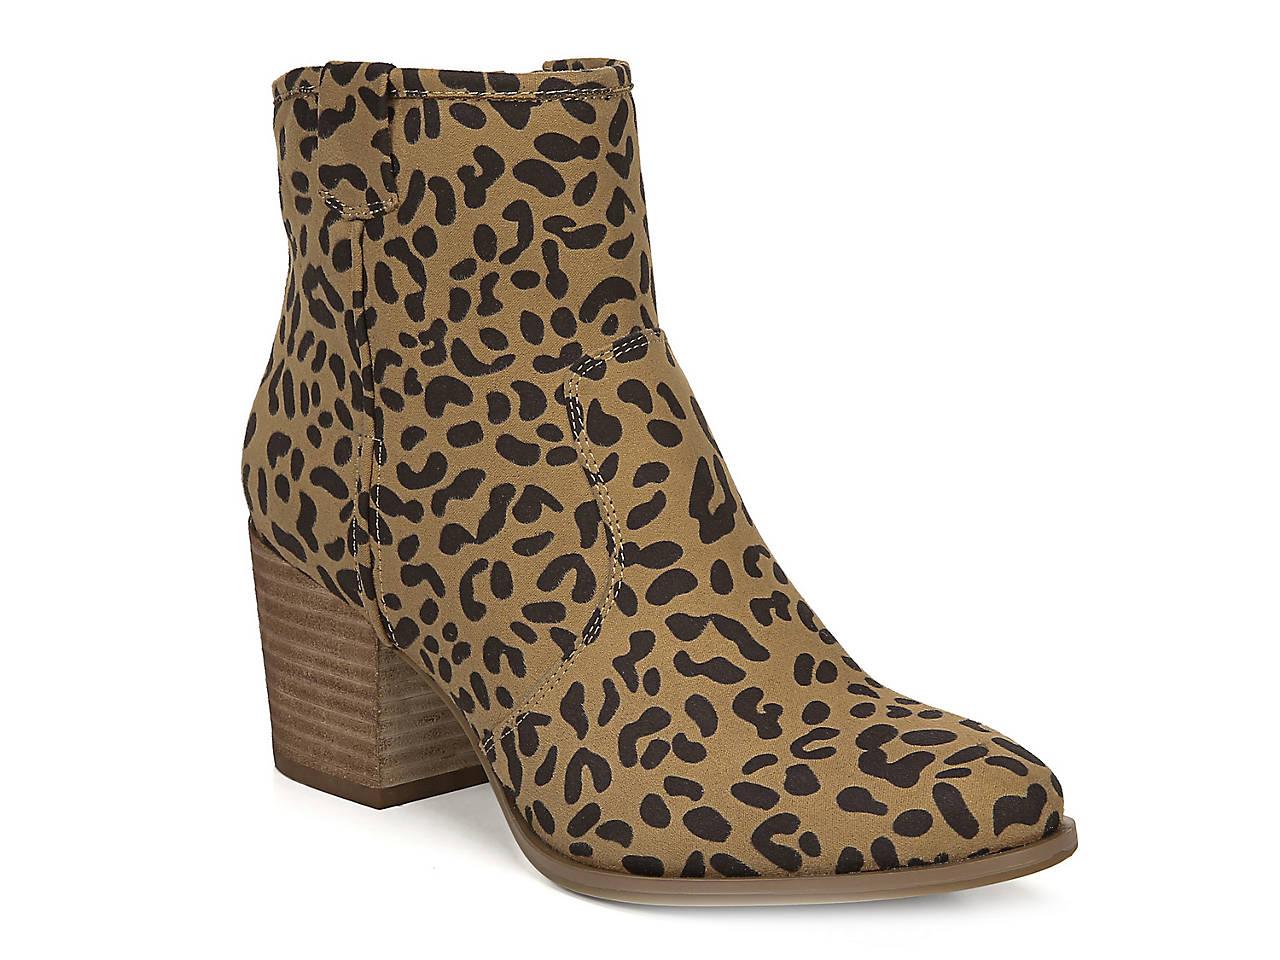 00832e05f478 Carlos by Carlos Santana Rowan Bootie Women s Shoes